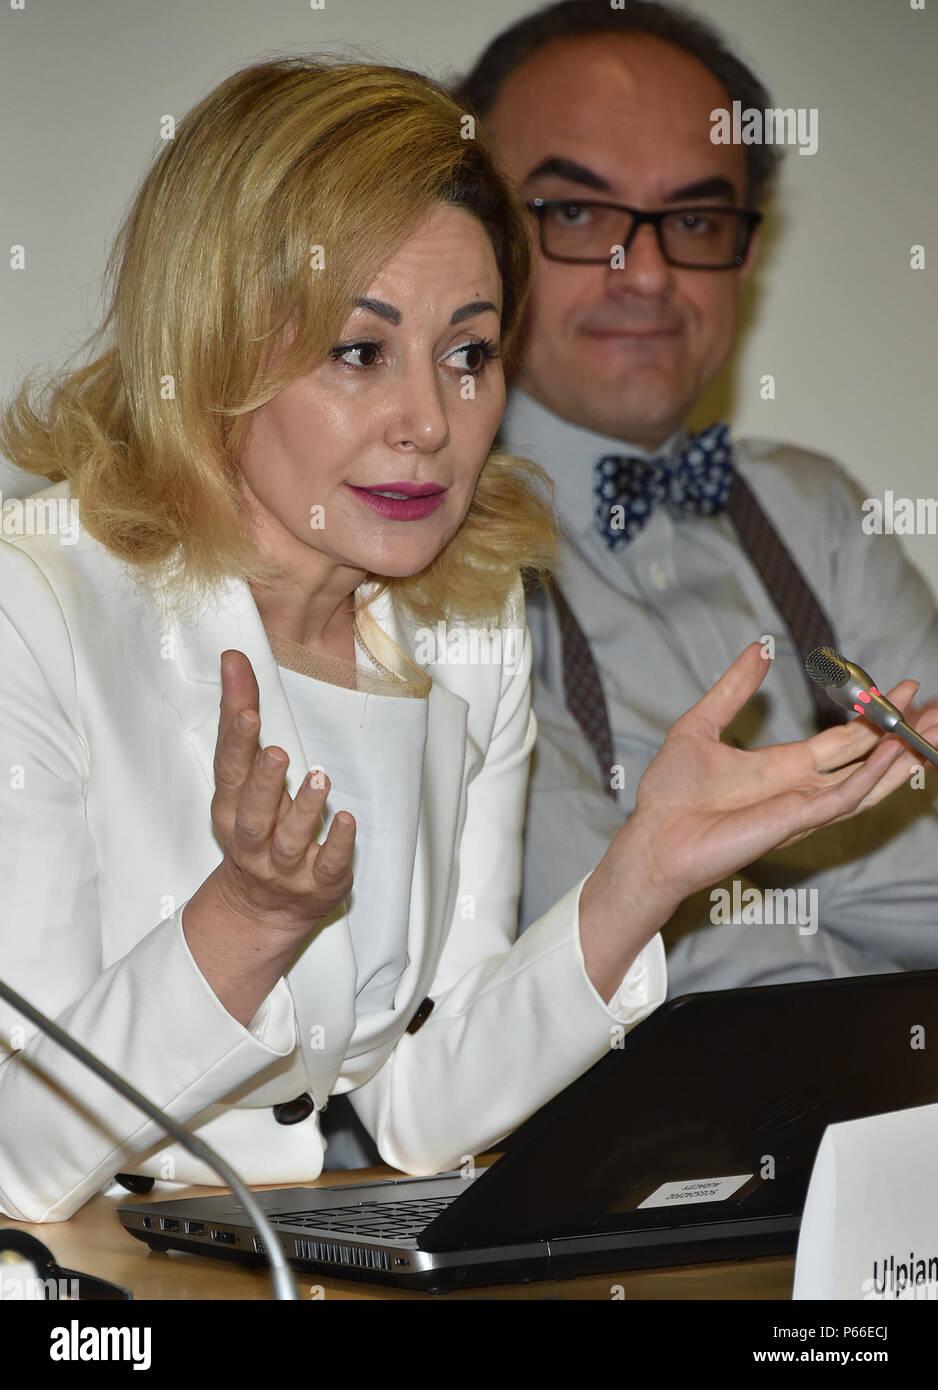 Ulpiana Lama, director of the Department for International